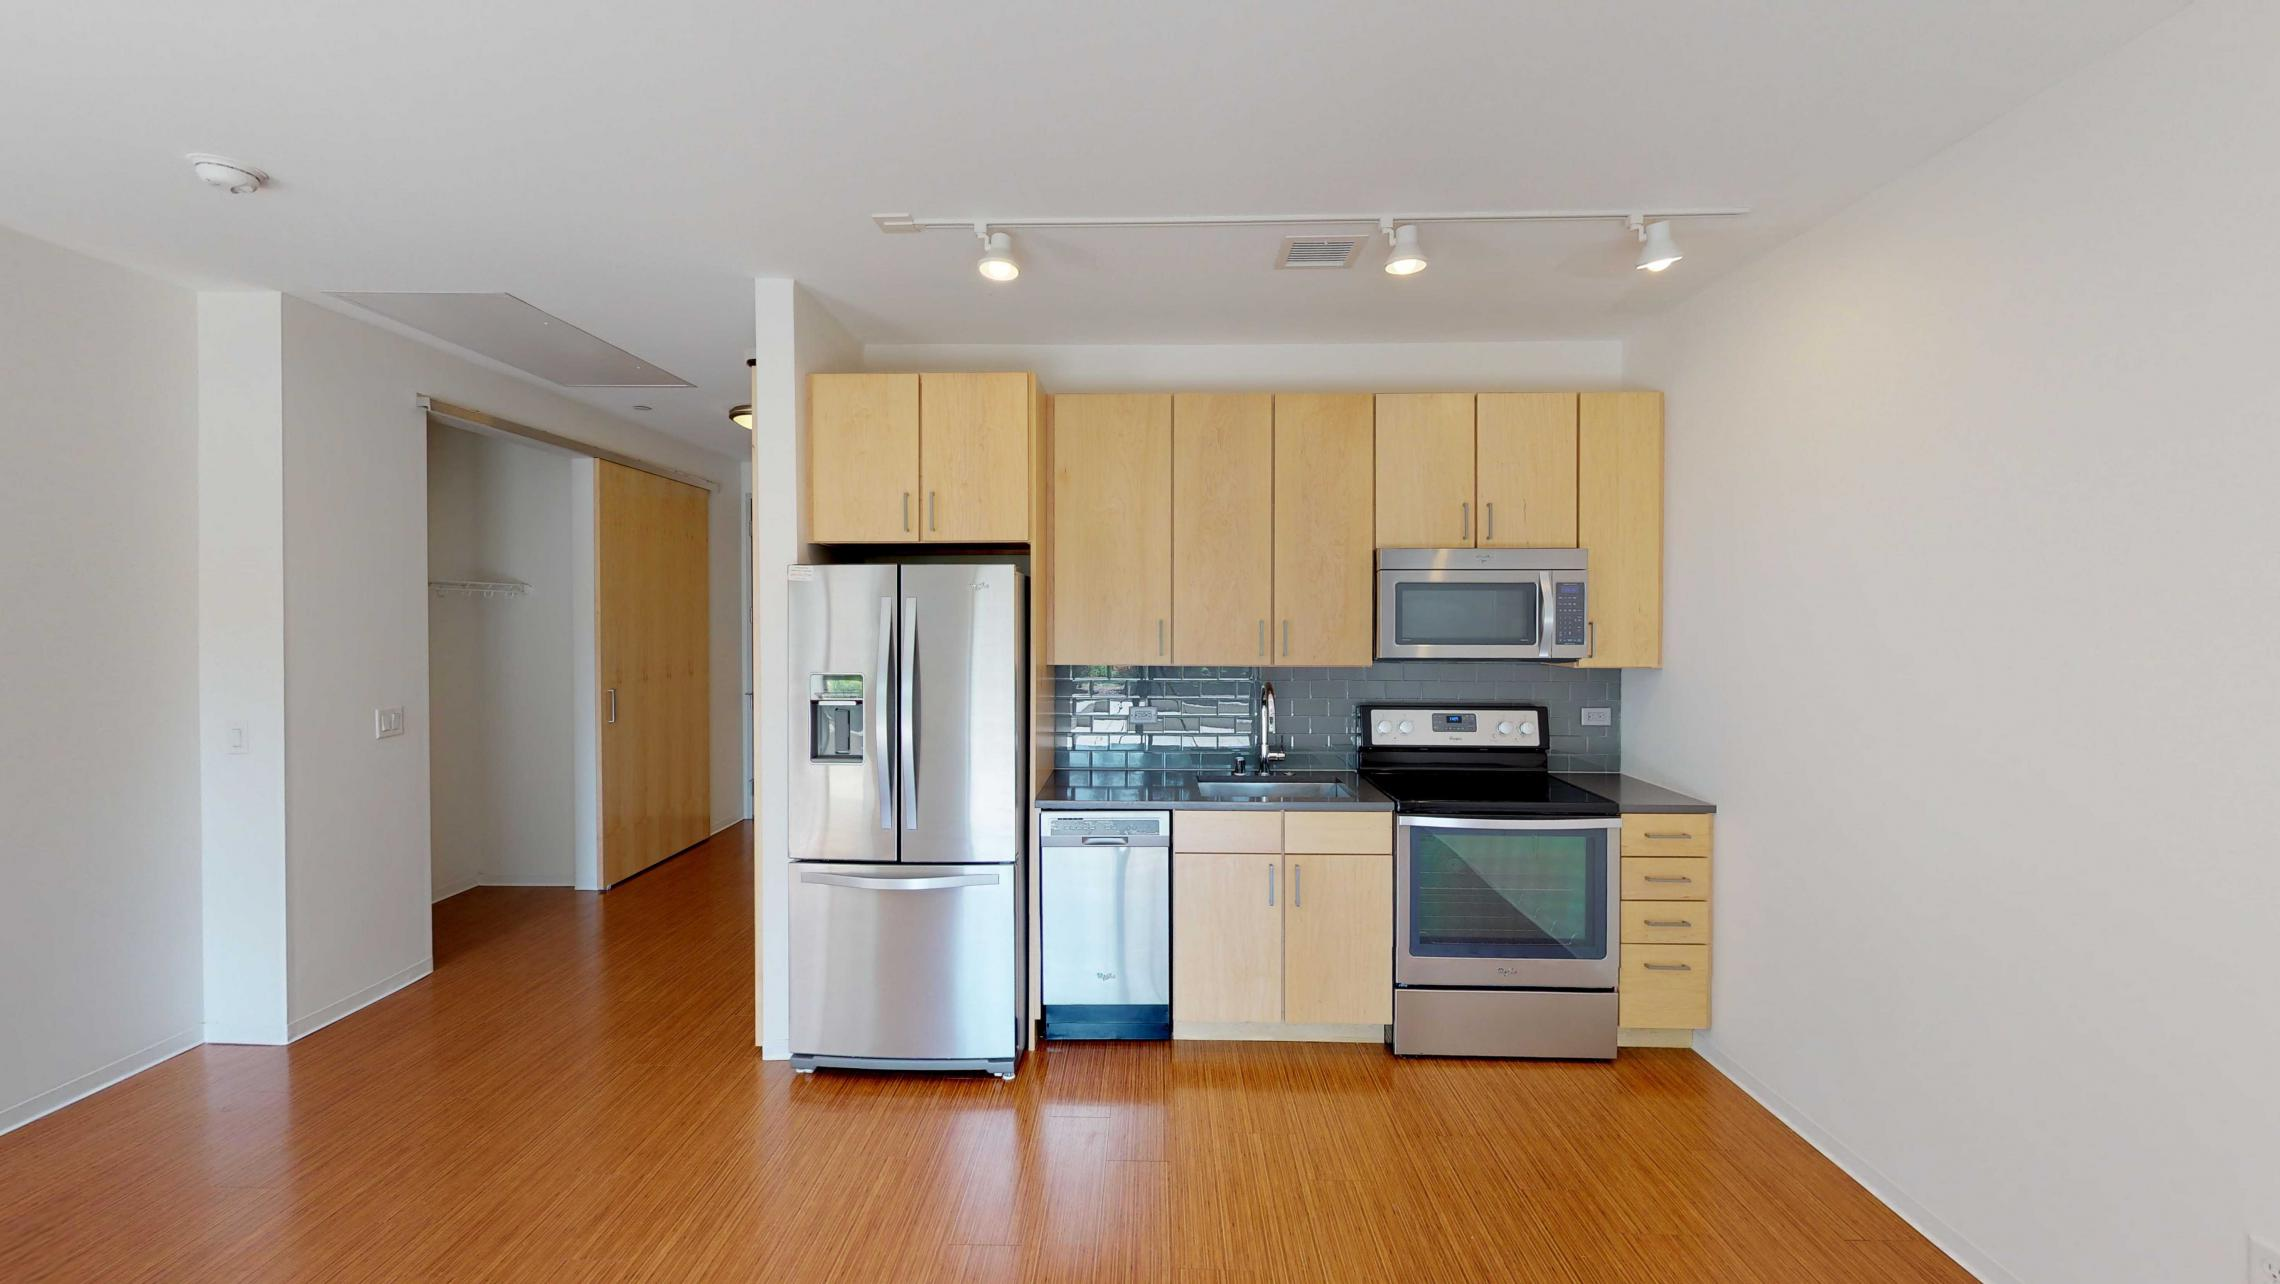 SEVEN27-Apartment-115-studio-lake view-modern-upscale-downtown-madison-patio-courtyard-living room-kitchen.jpg